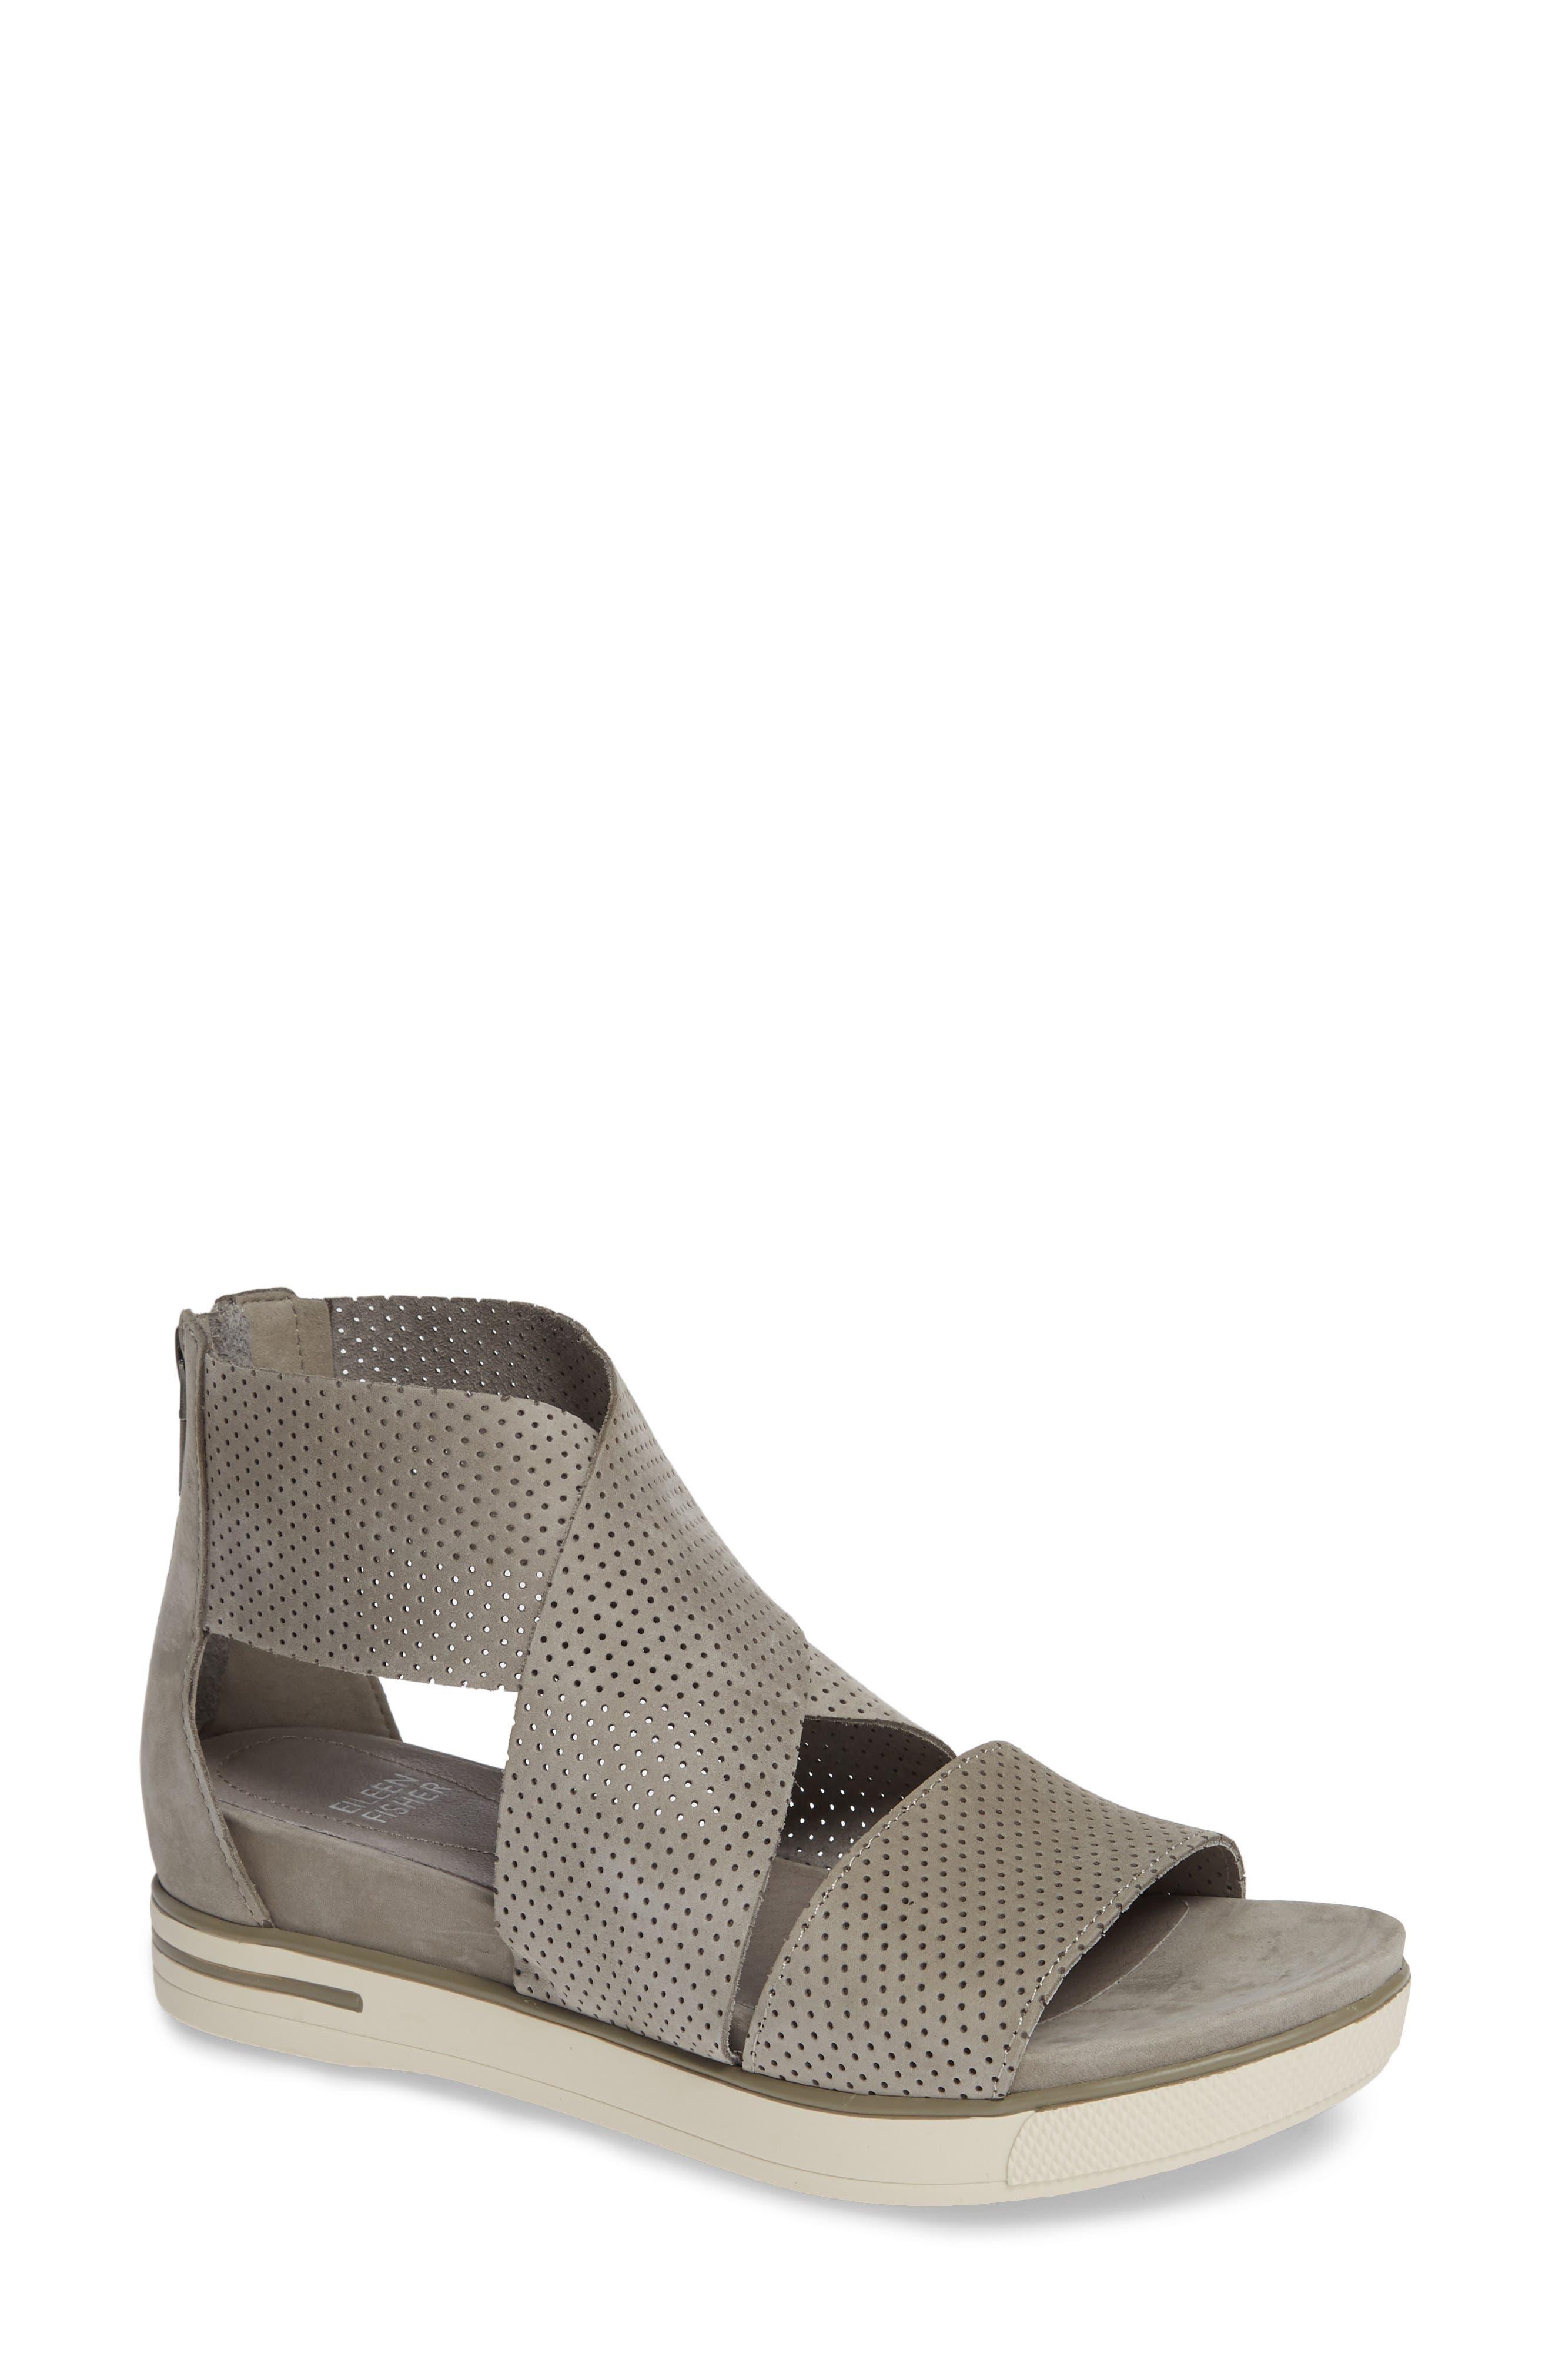 Sport Platform Sandal,                         Main,                         color, MOON/ MOON NUBUCK